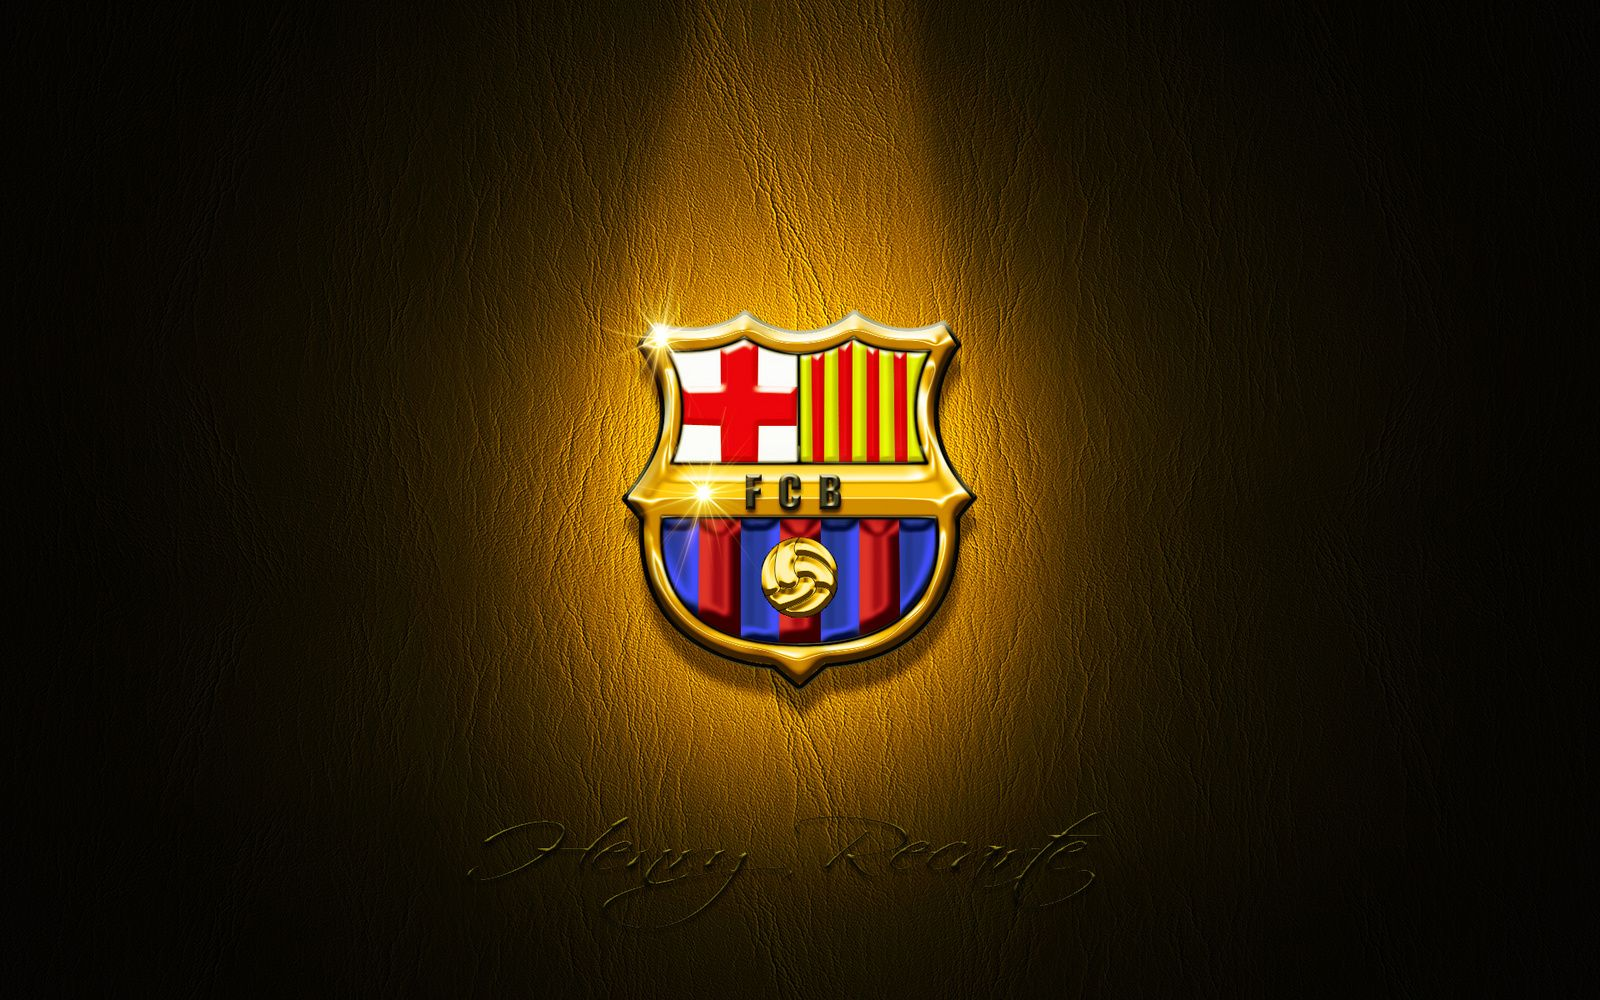 Equipo De Deporte Doodle Fondo Transparente: Fondo De Pantalla Logo Piel Escudo Fc Barcelona